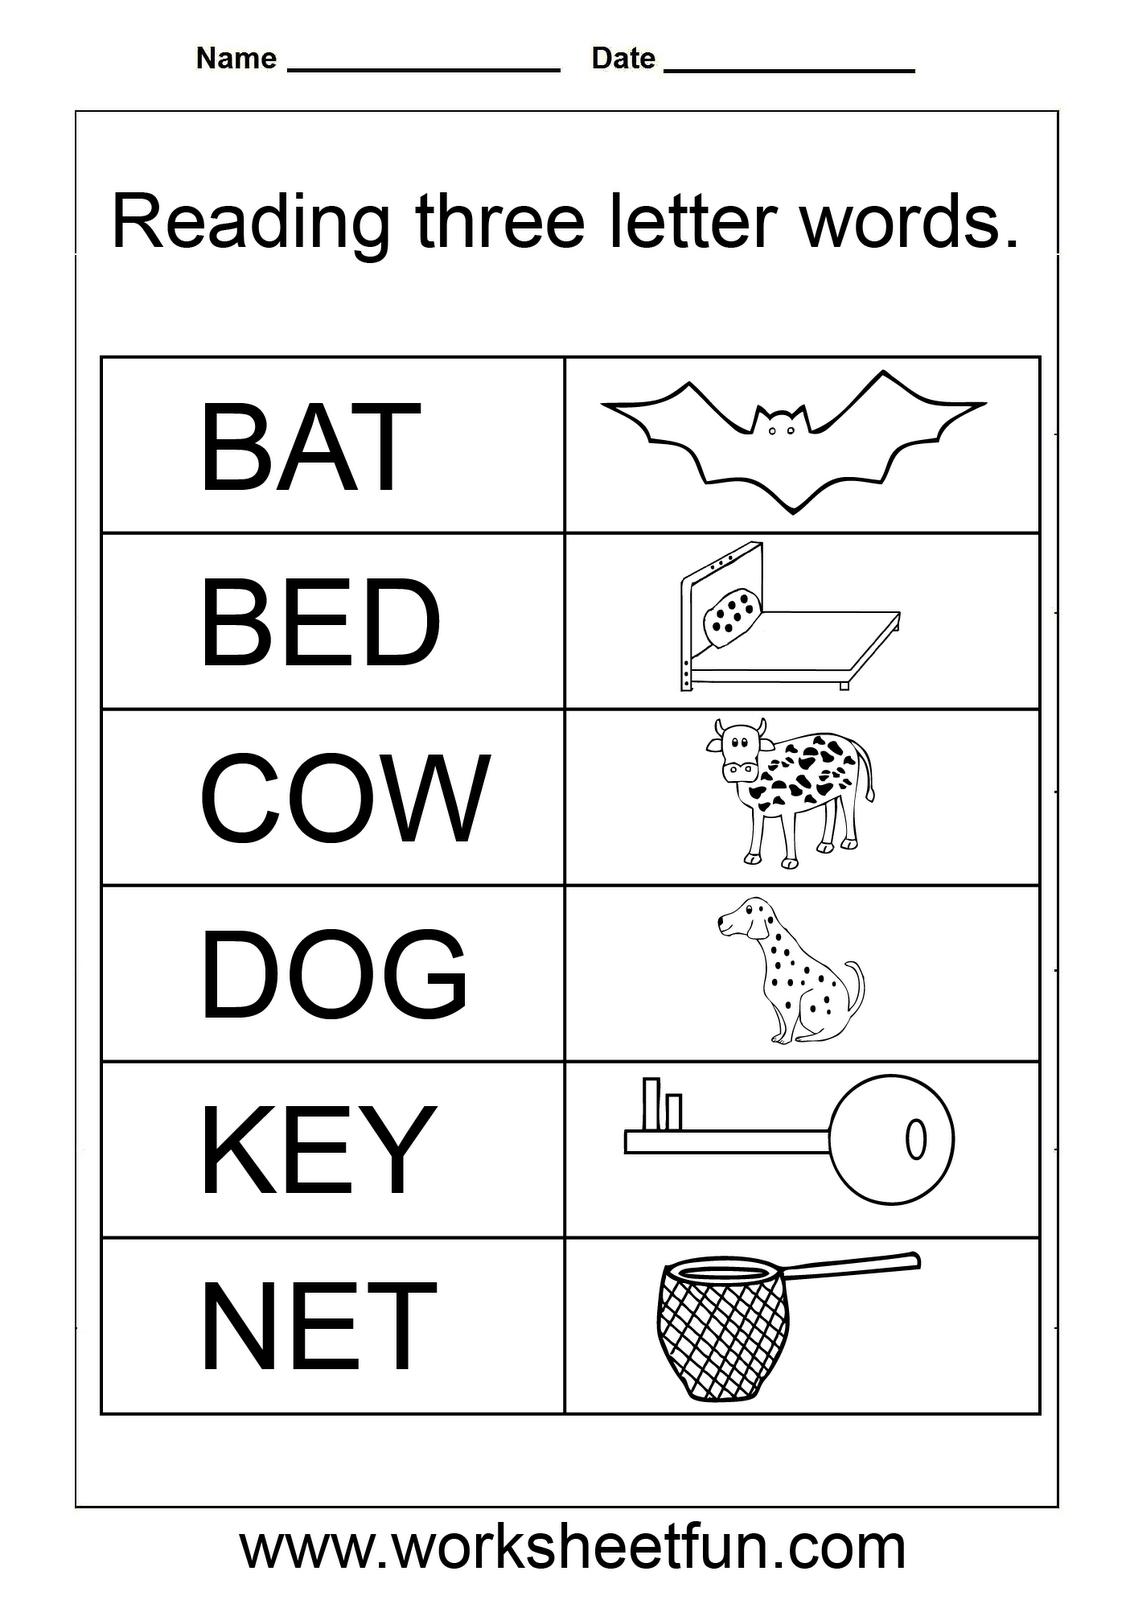 Simple Words - Worksheet | Homeschooling: Reading & Grammar | Free Printable English Reading Worksheets For Kindergarten